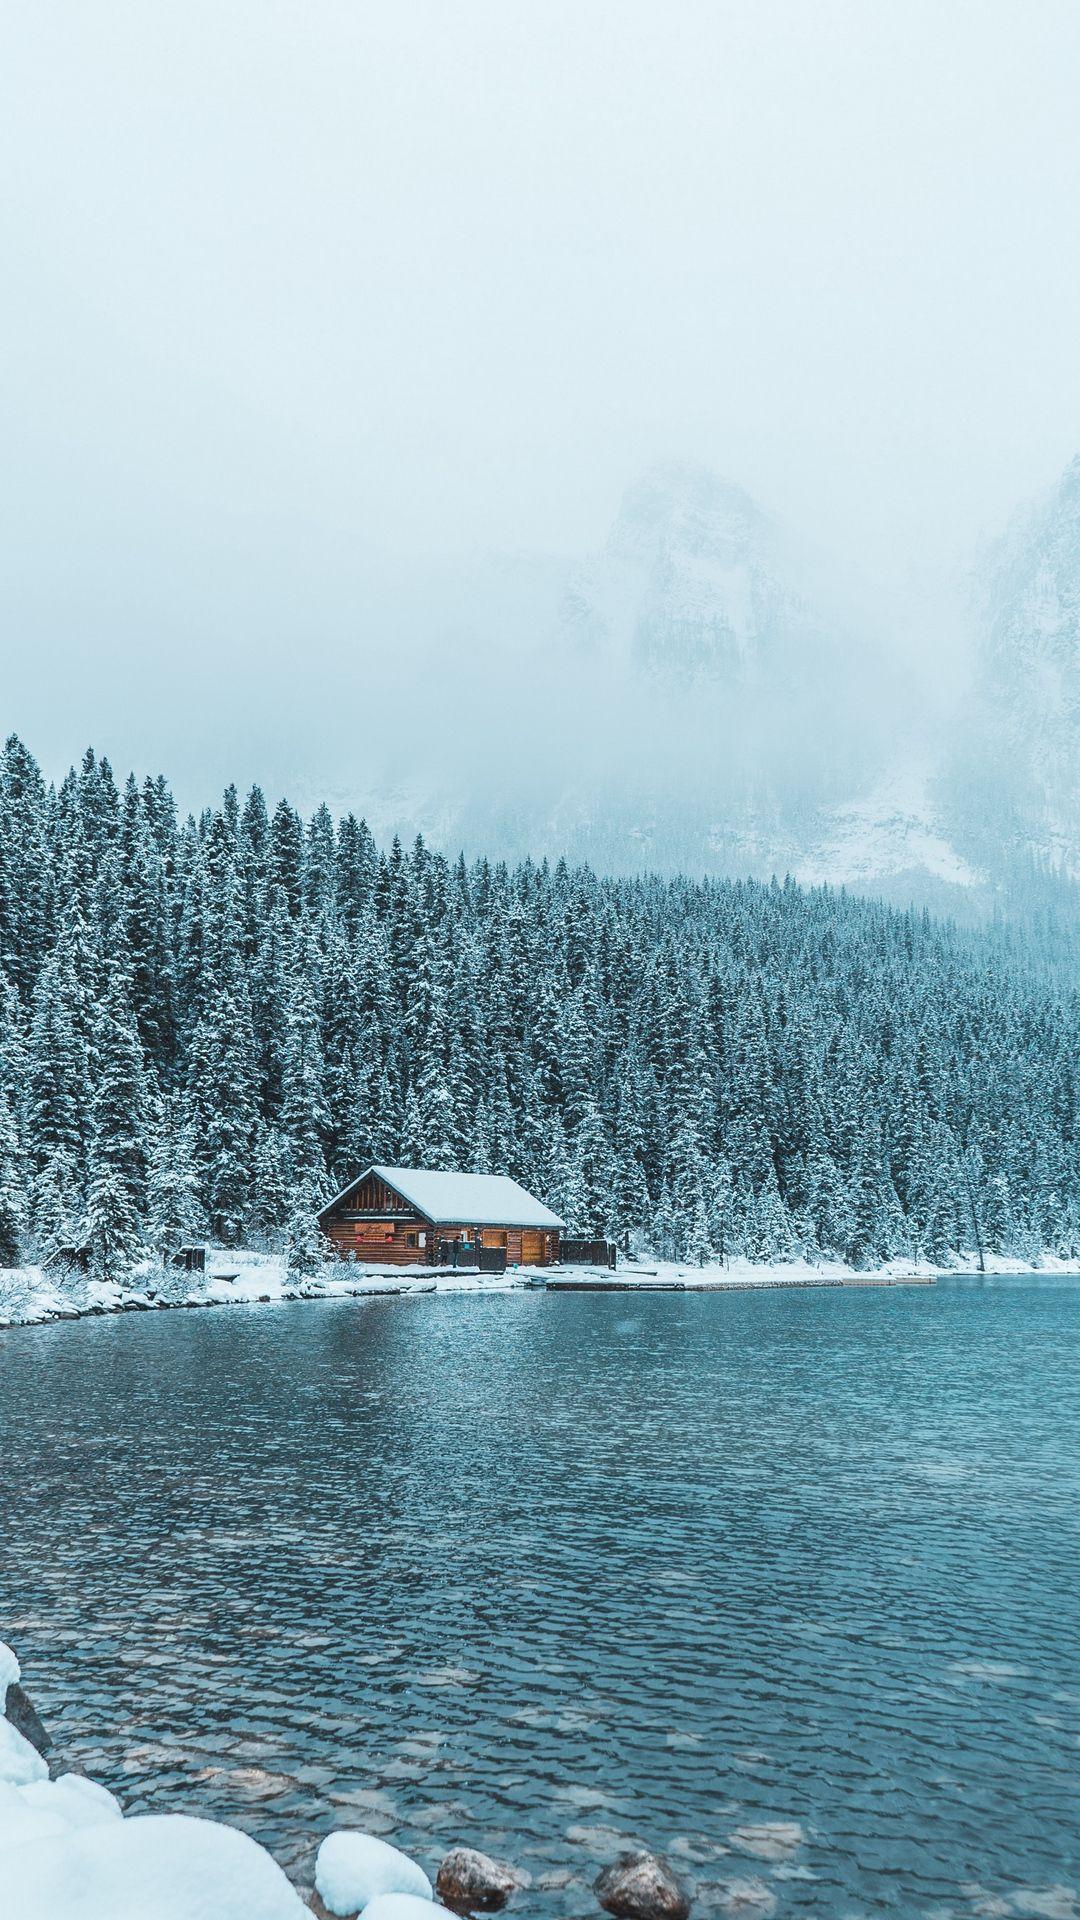 Winter Mountains Lake House